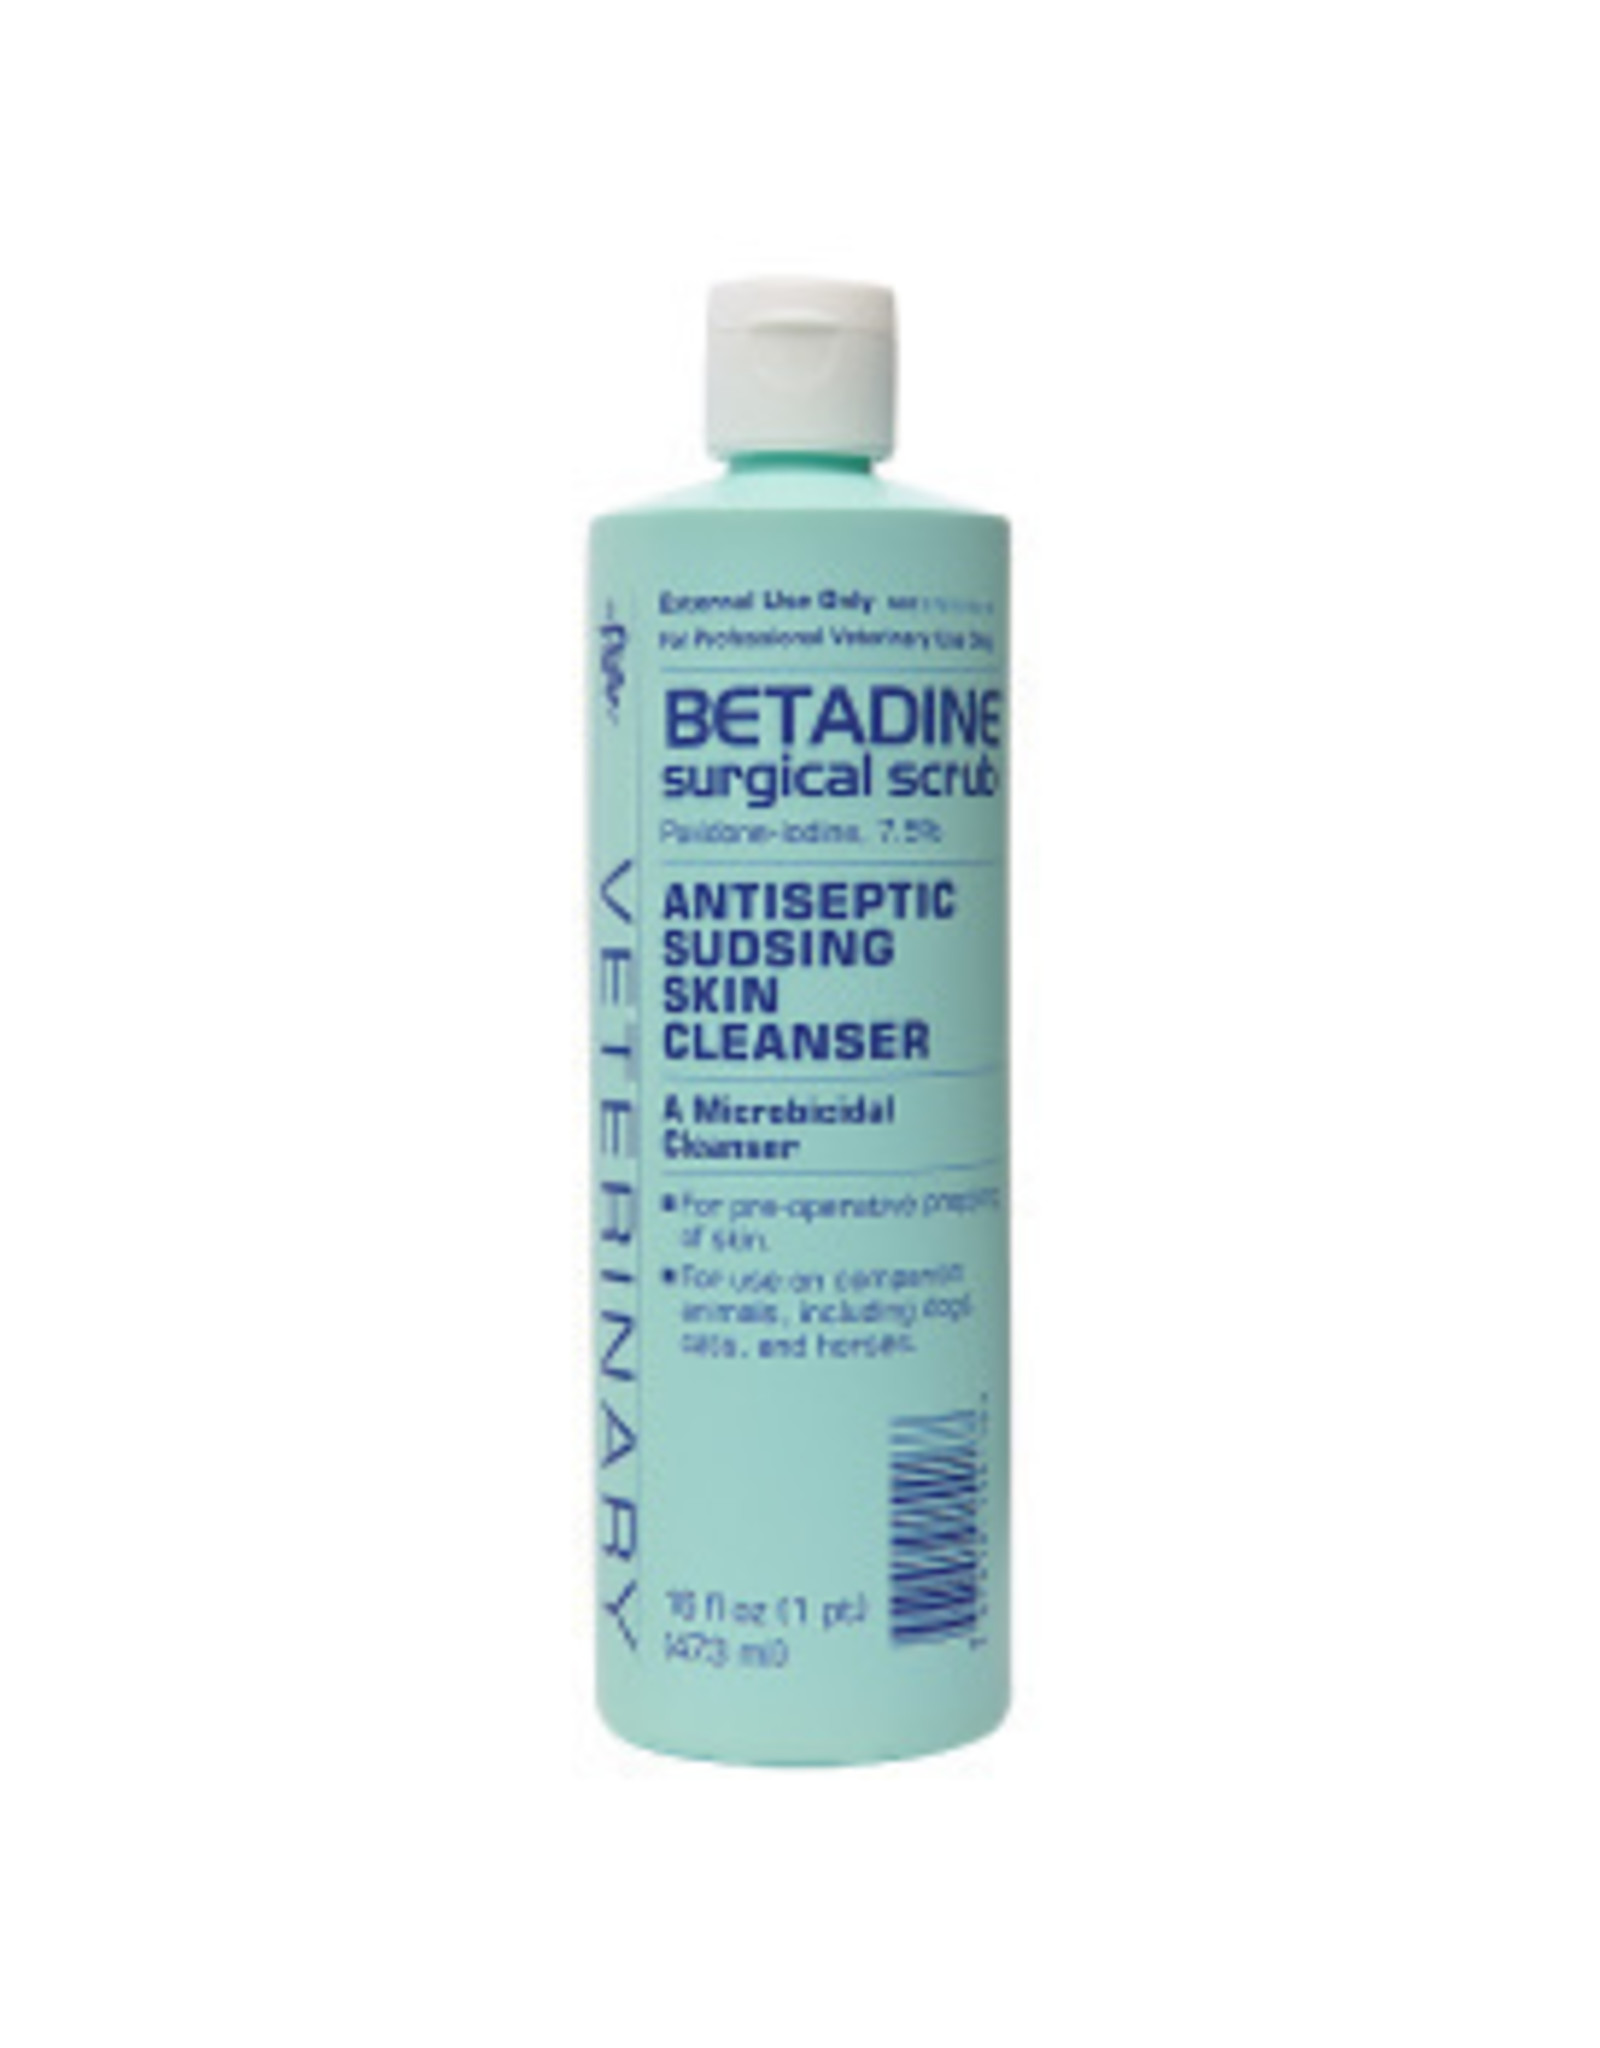 Betadine Surgical Scrub - 16oz